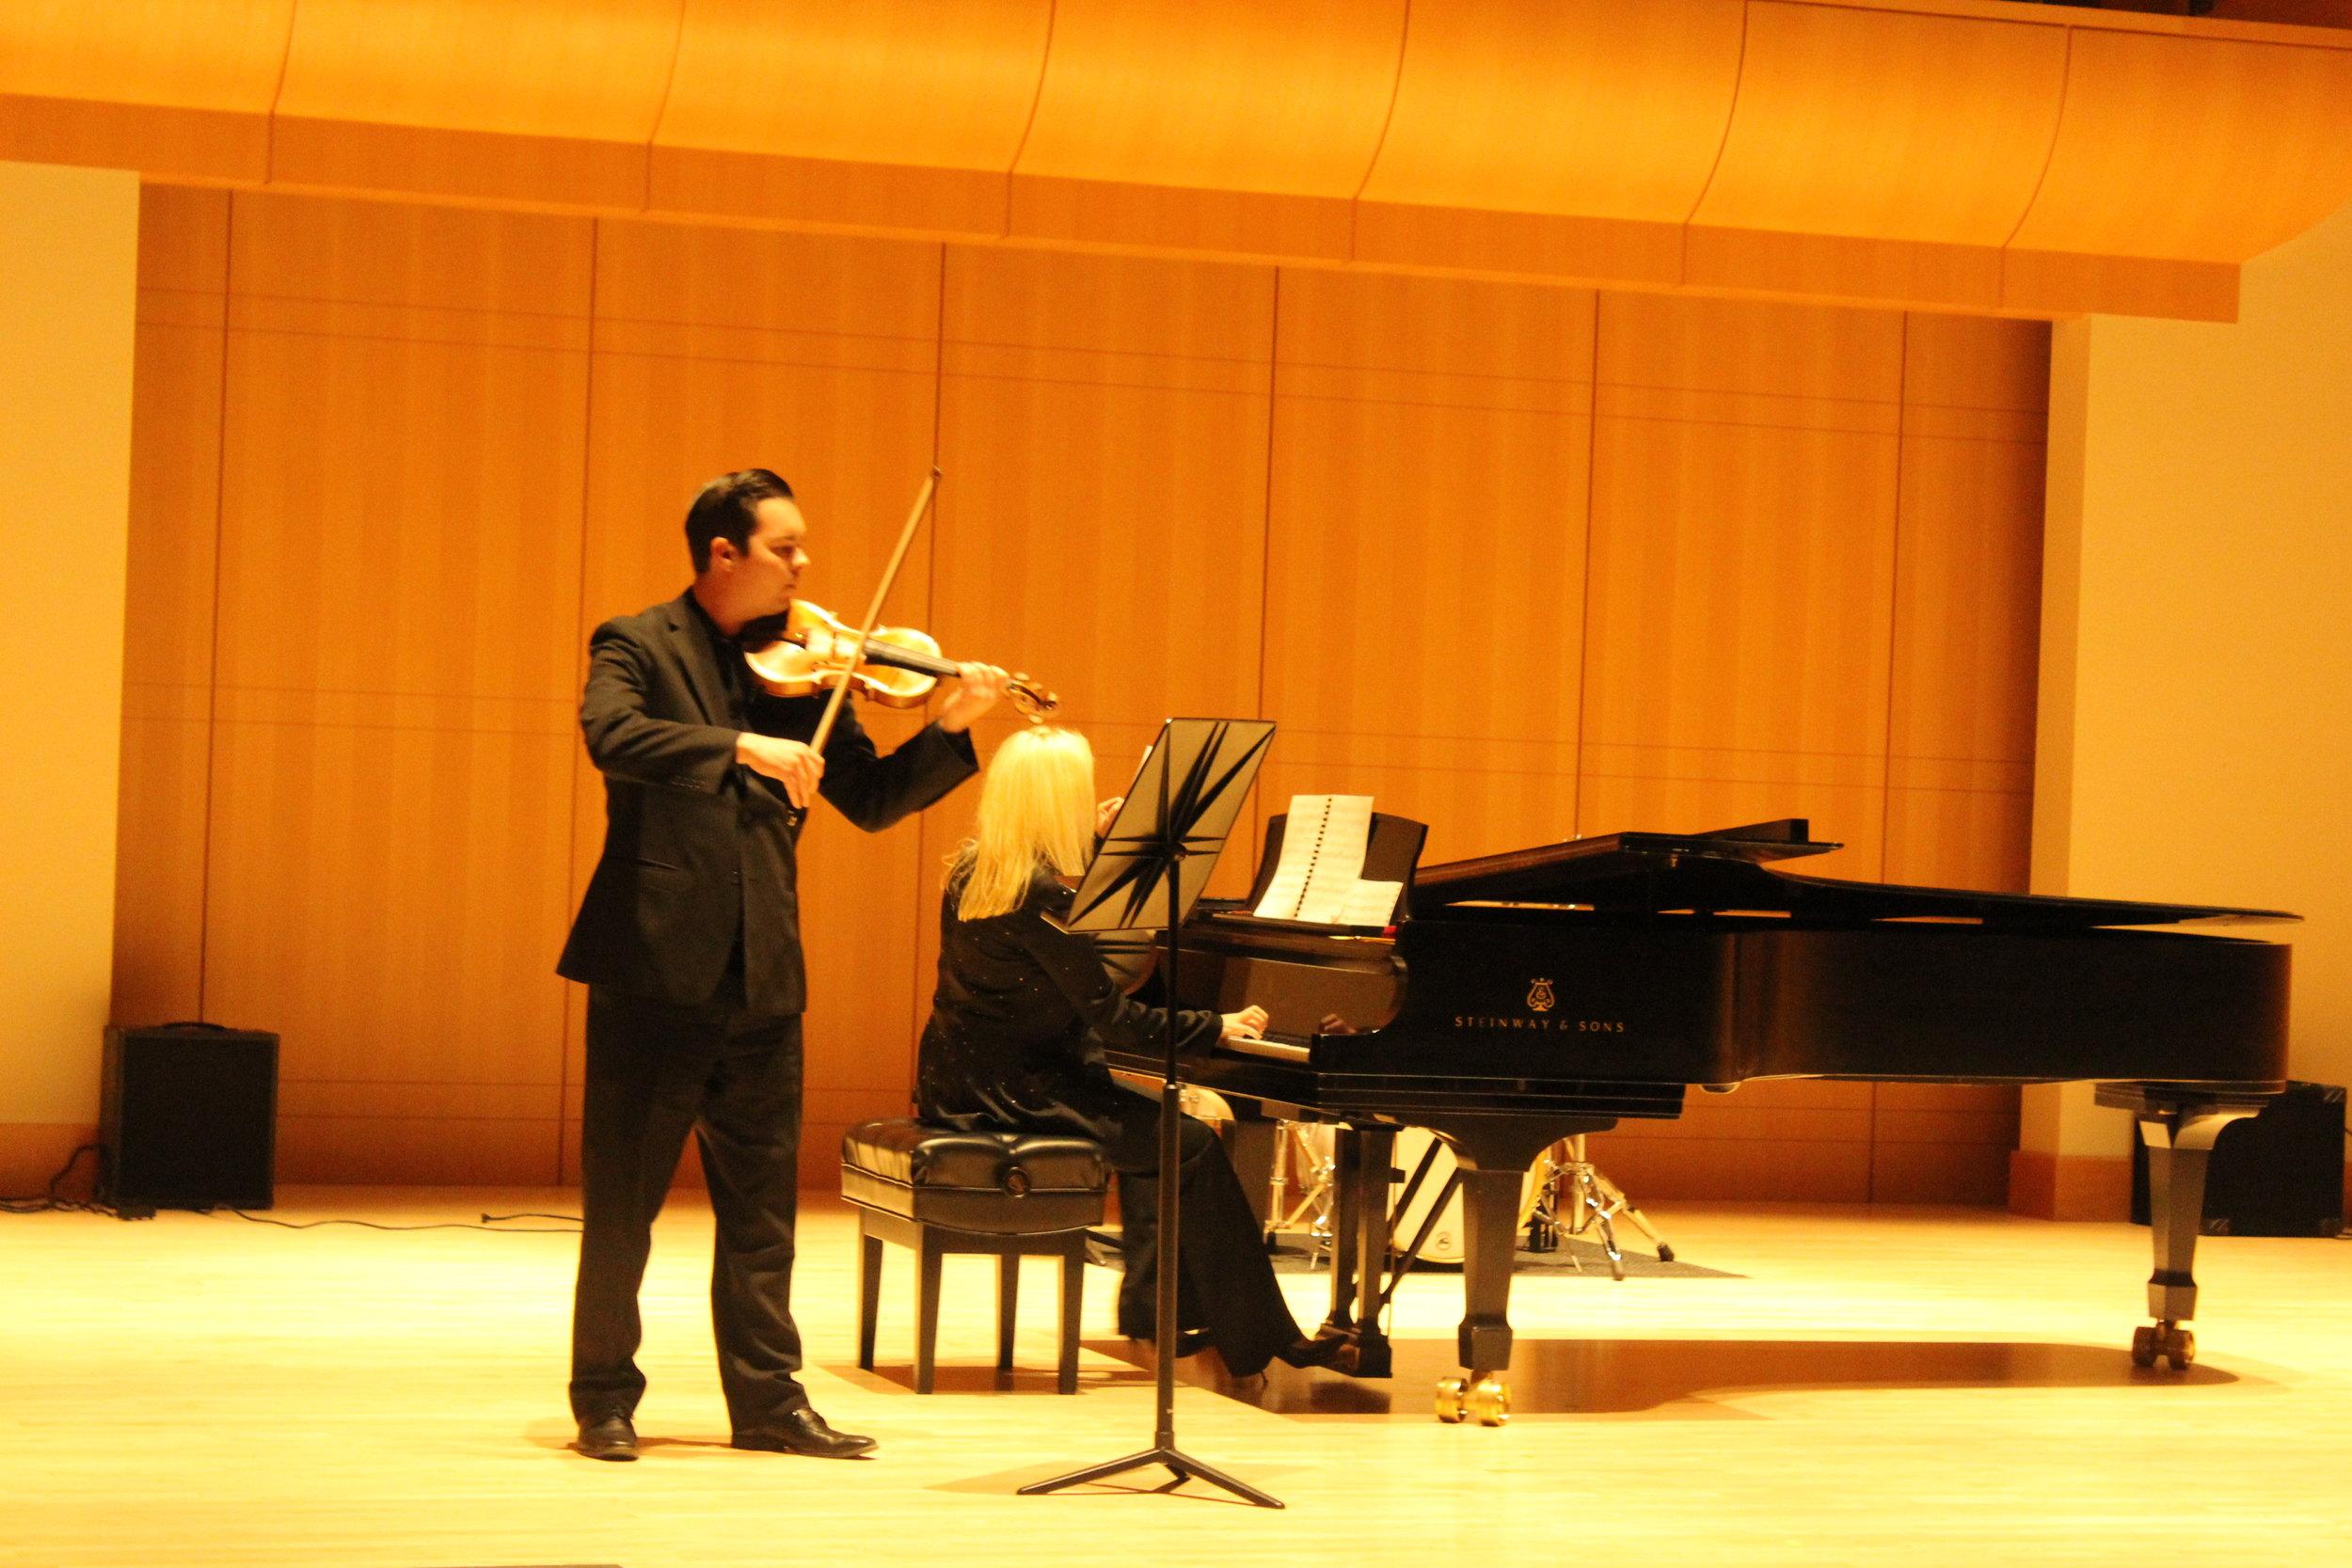 faculty-composers-concert-jade-eriksson_33161765291_o.jpg